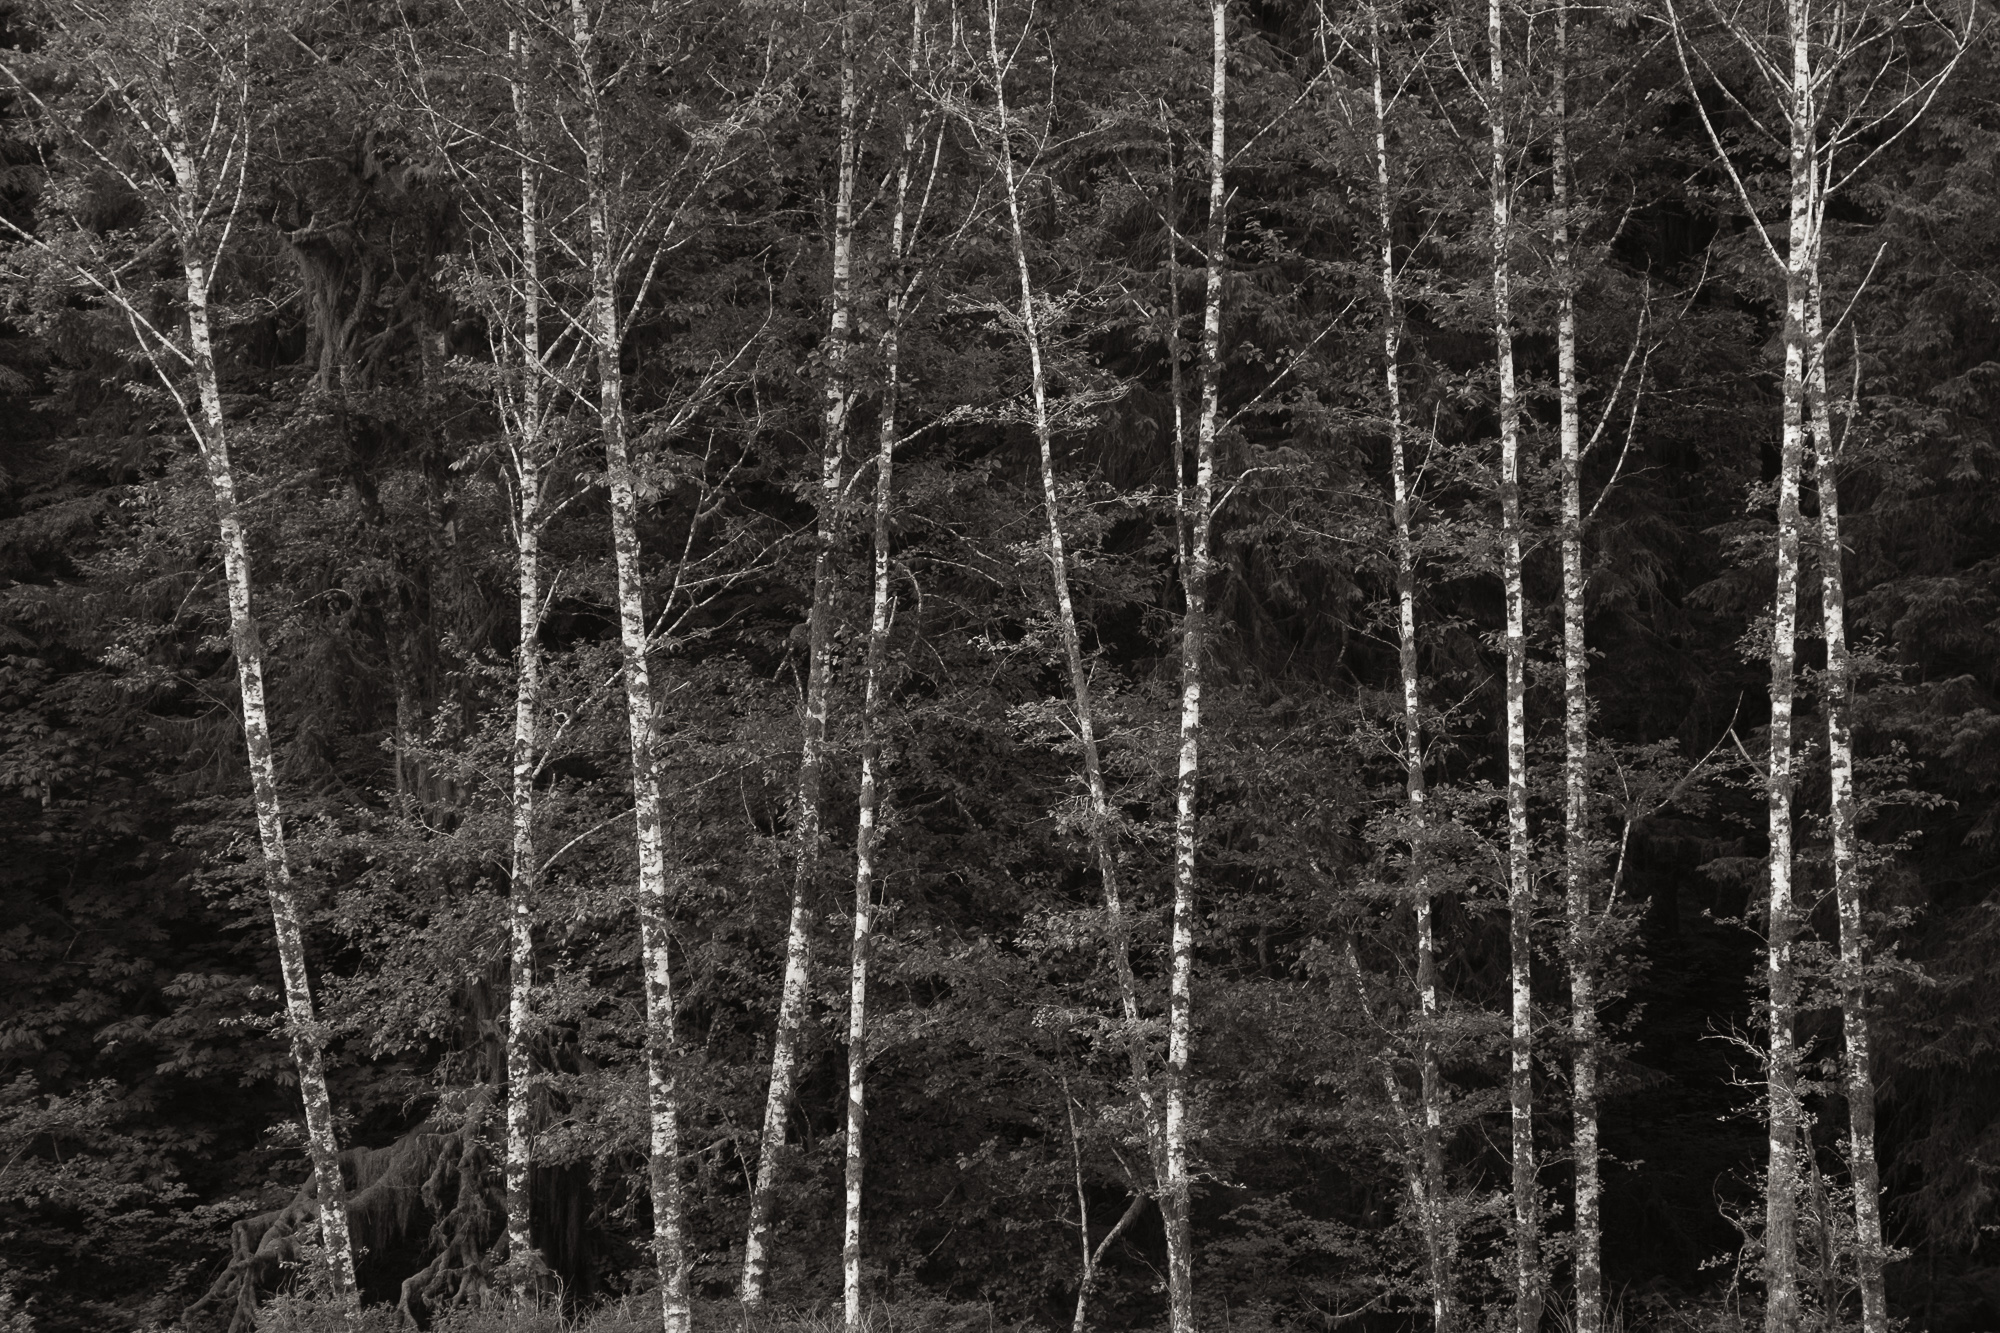 Longenbaugh-olympic-national-park-31.jpg